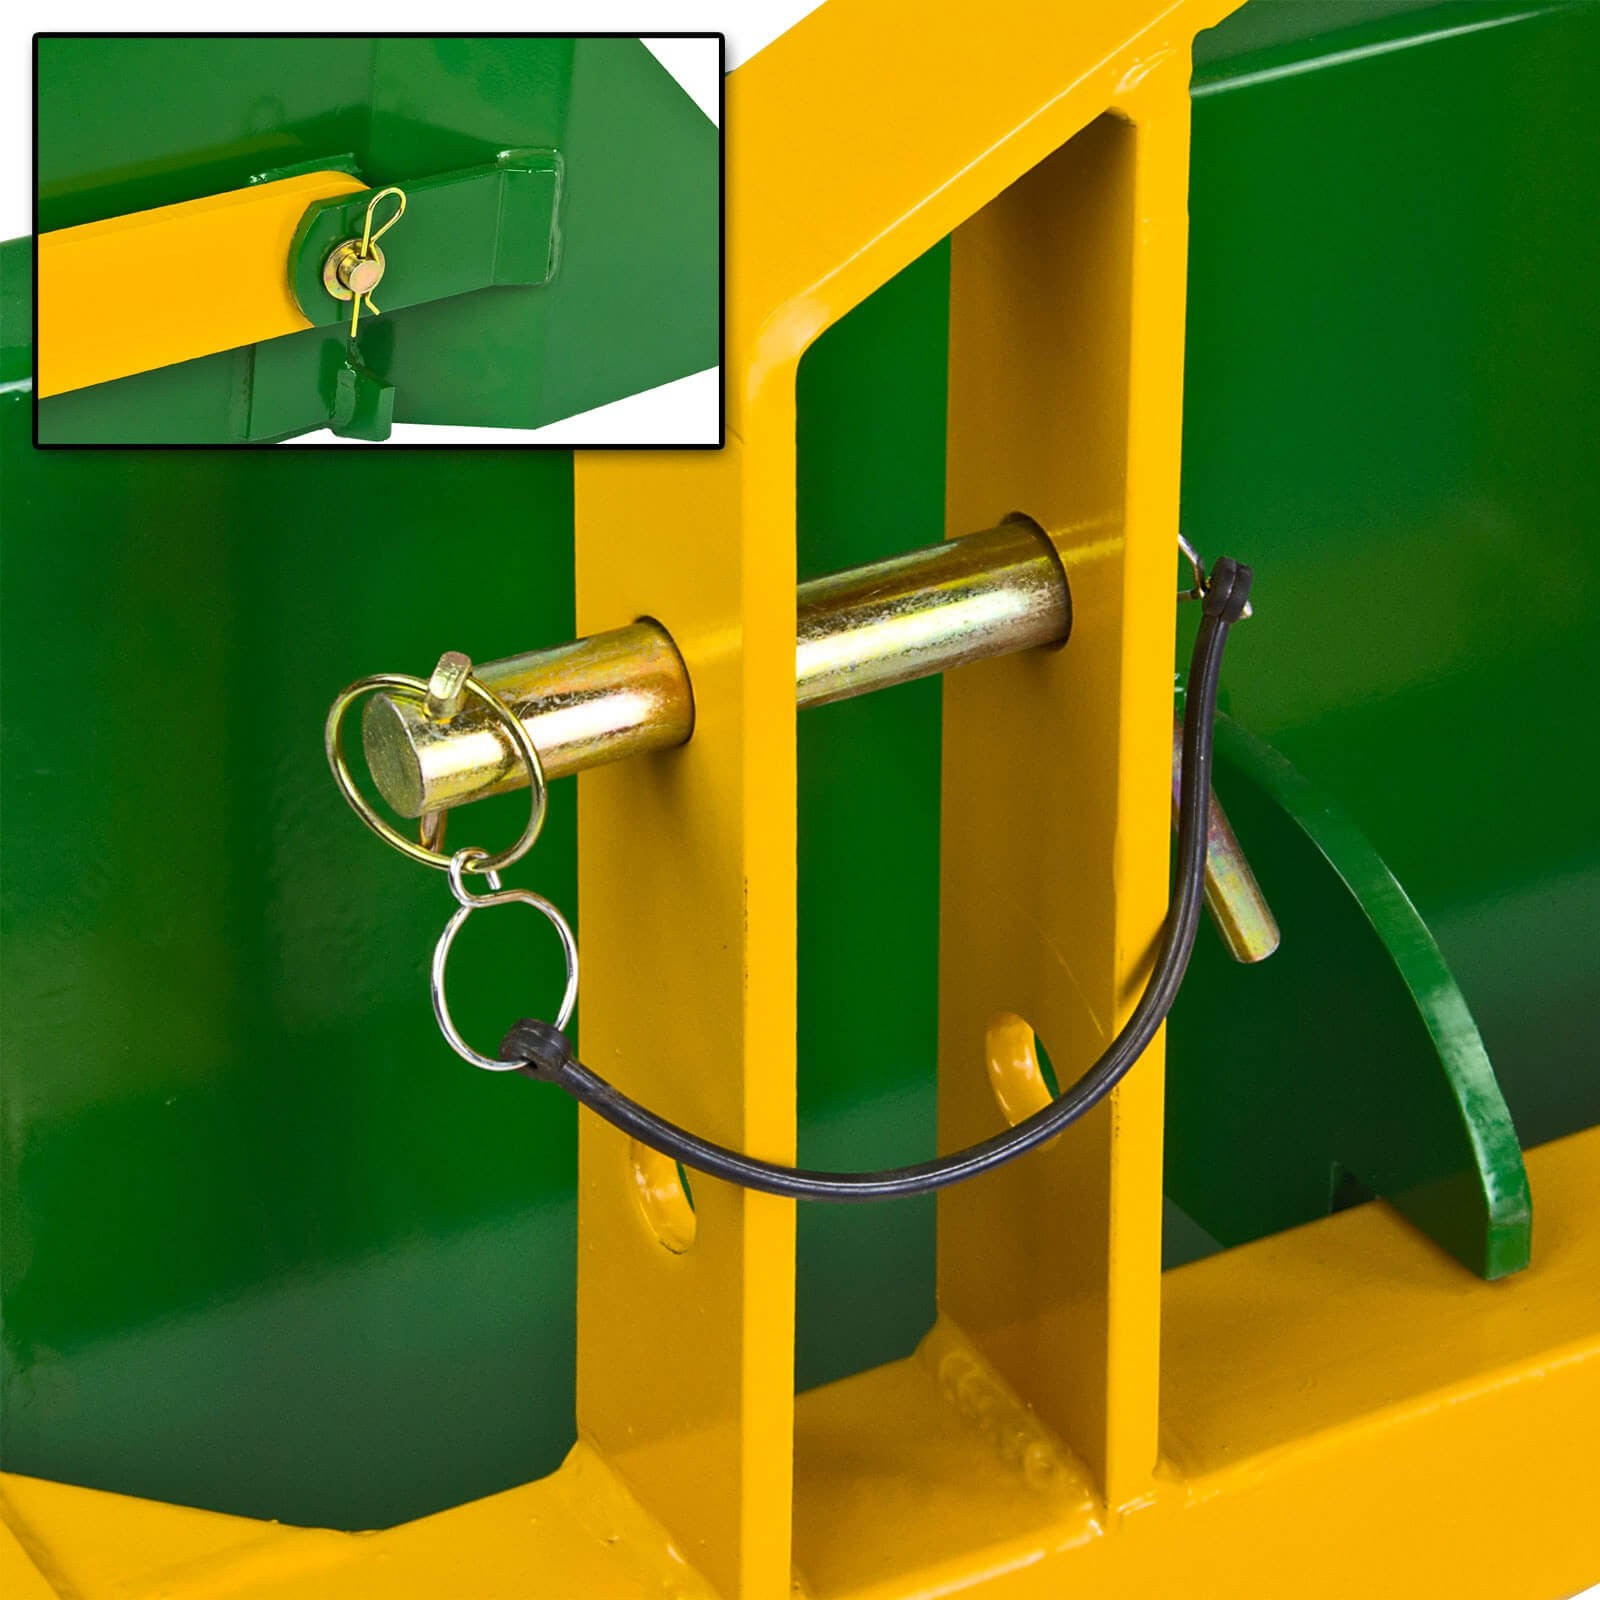 heckschaufel dhs 100 m f r traktor kippbar. Black Bedroom Furniture Sets. Home Design Ideas